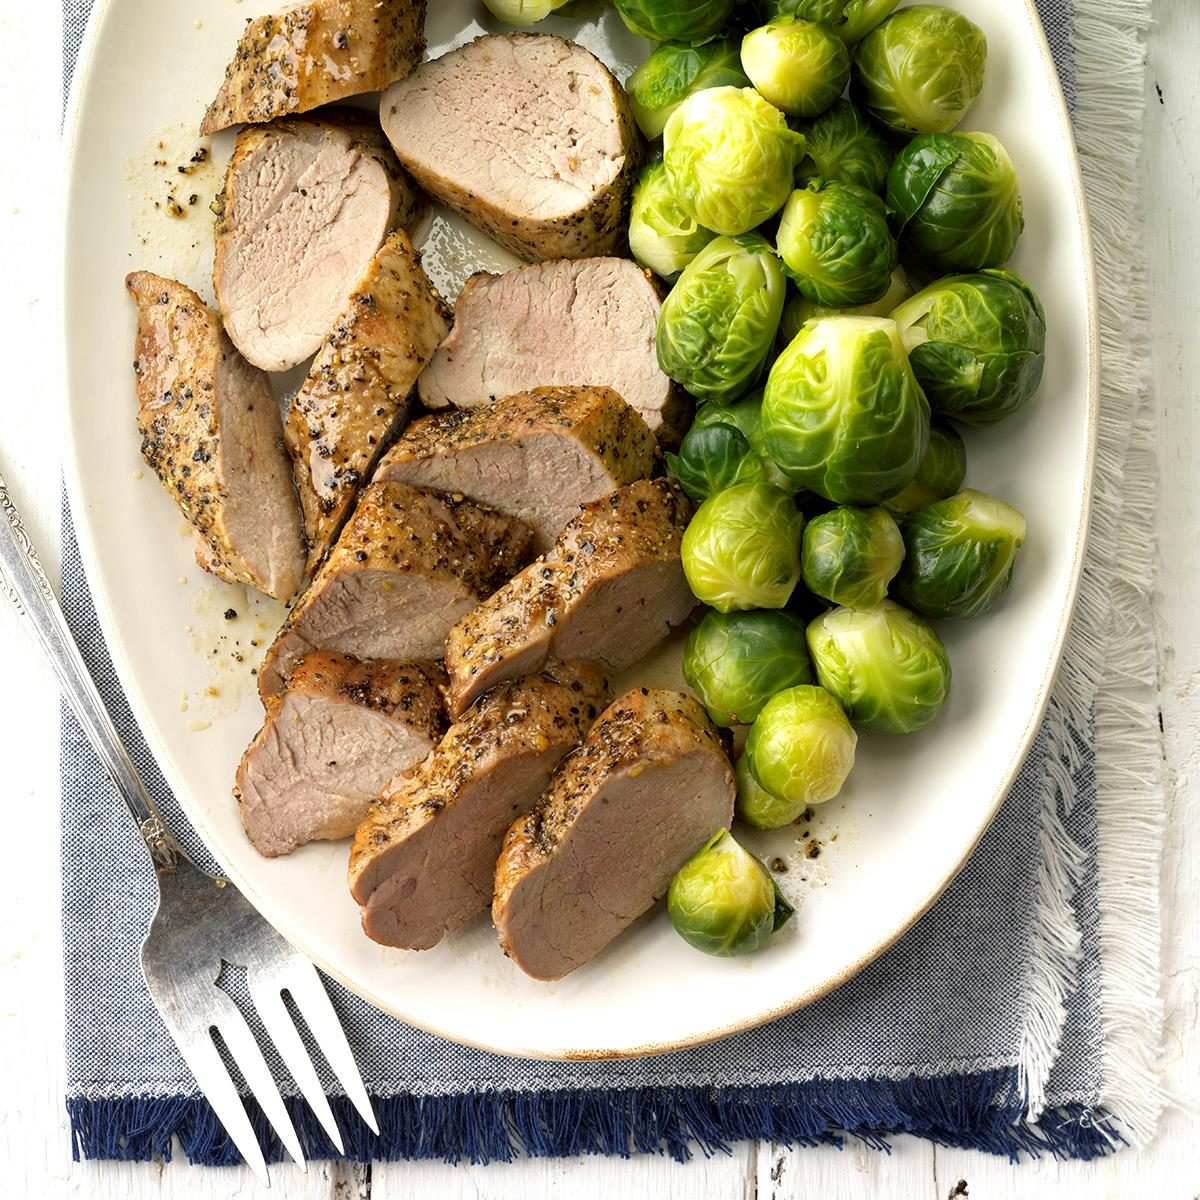 Pork Tenderloin Recipes: Maple-Glazed Pork Tenderloin Recipe